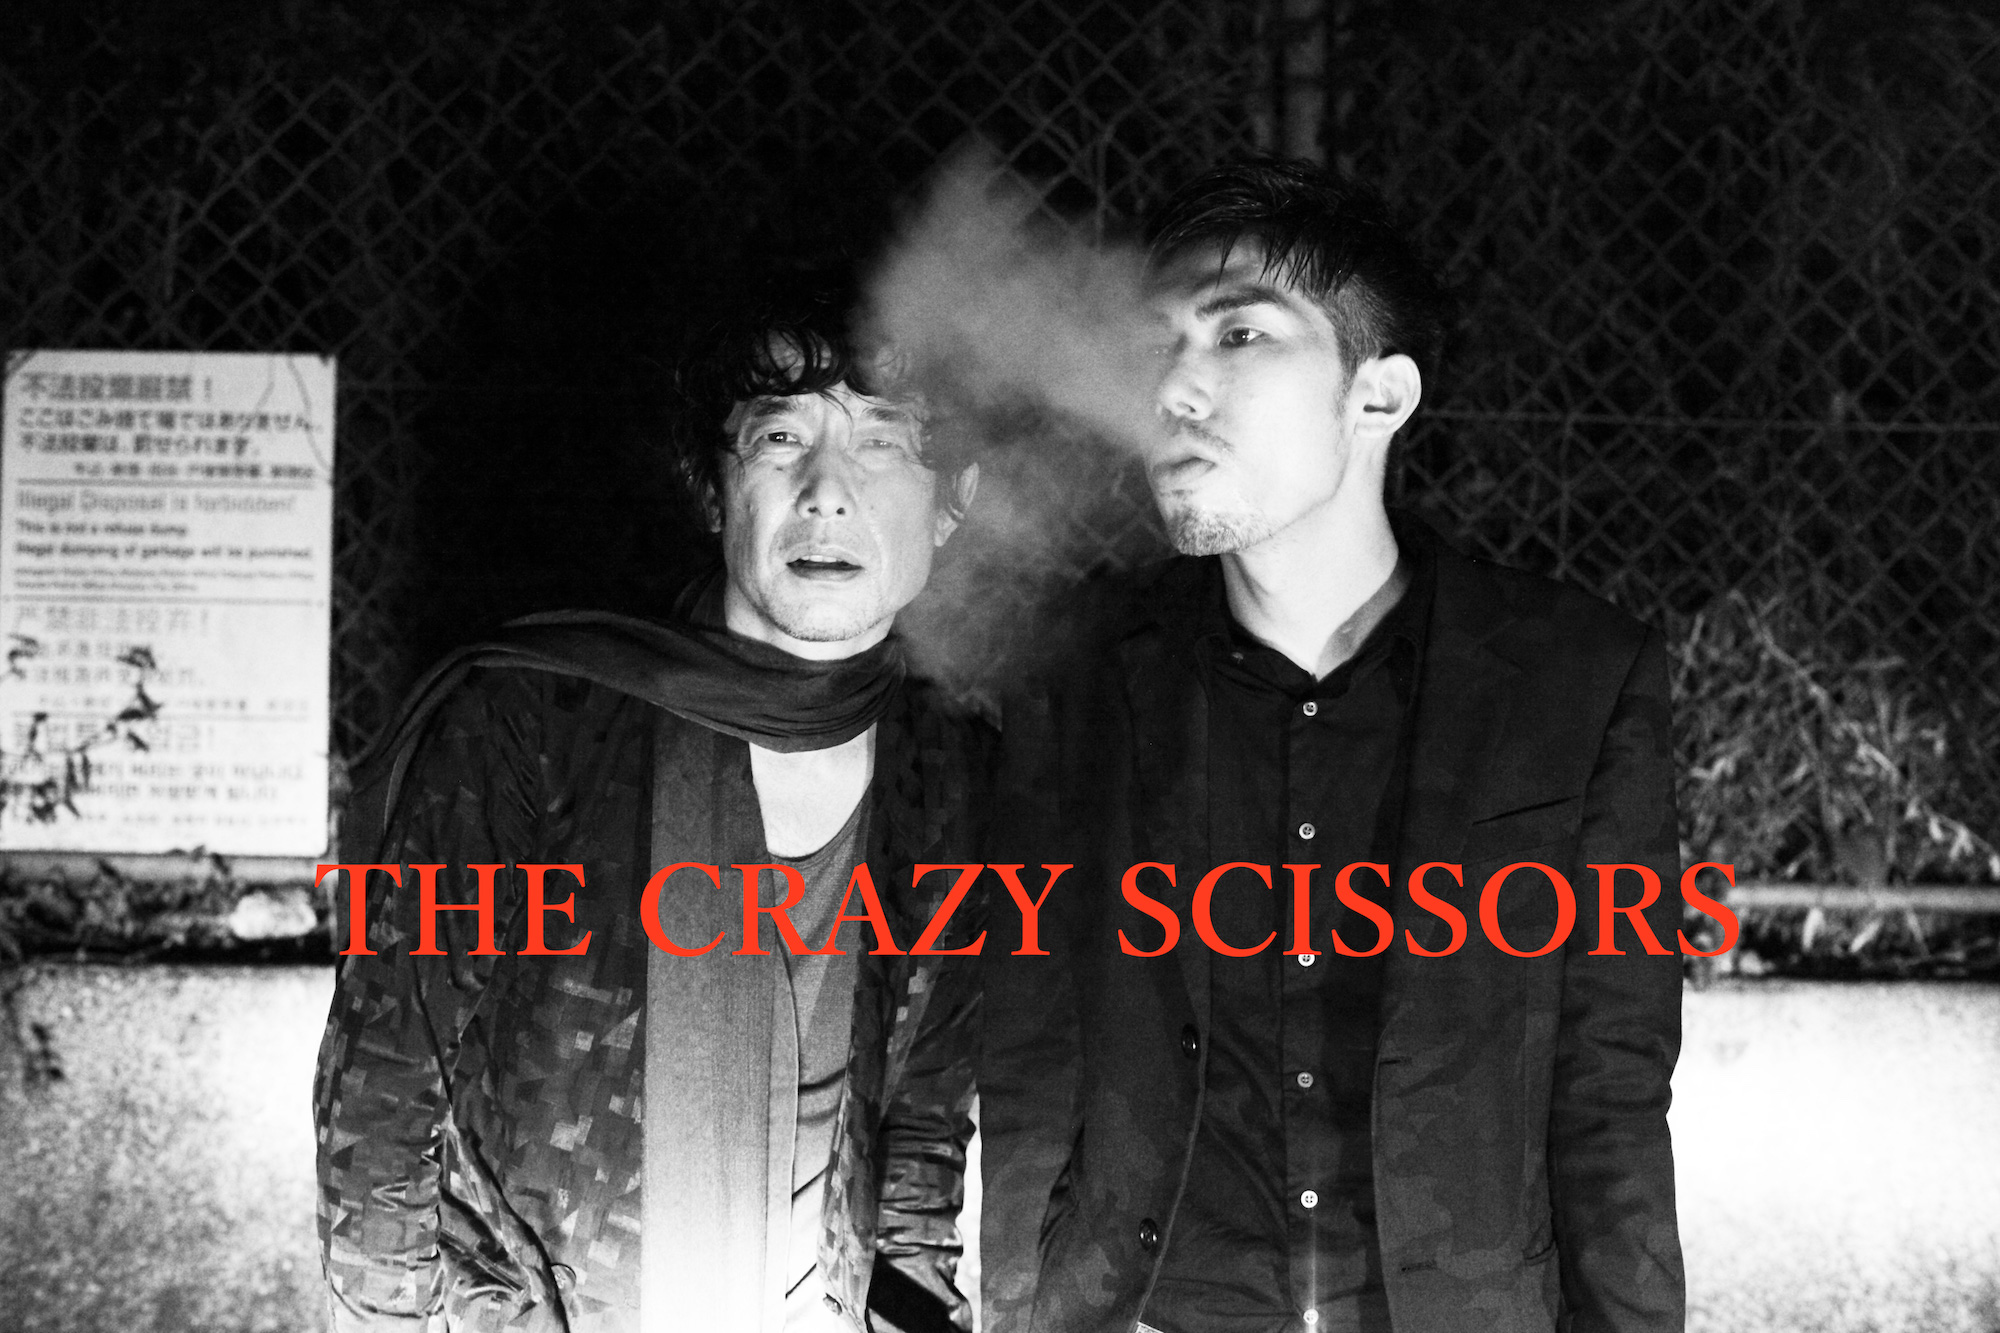 55 GO-GO LIVE vol.3 THE CRAZY SCISSORS「花と音と映像と魂と」op:act GG TOP